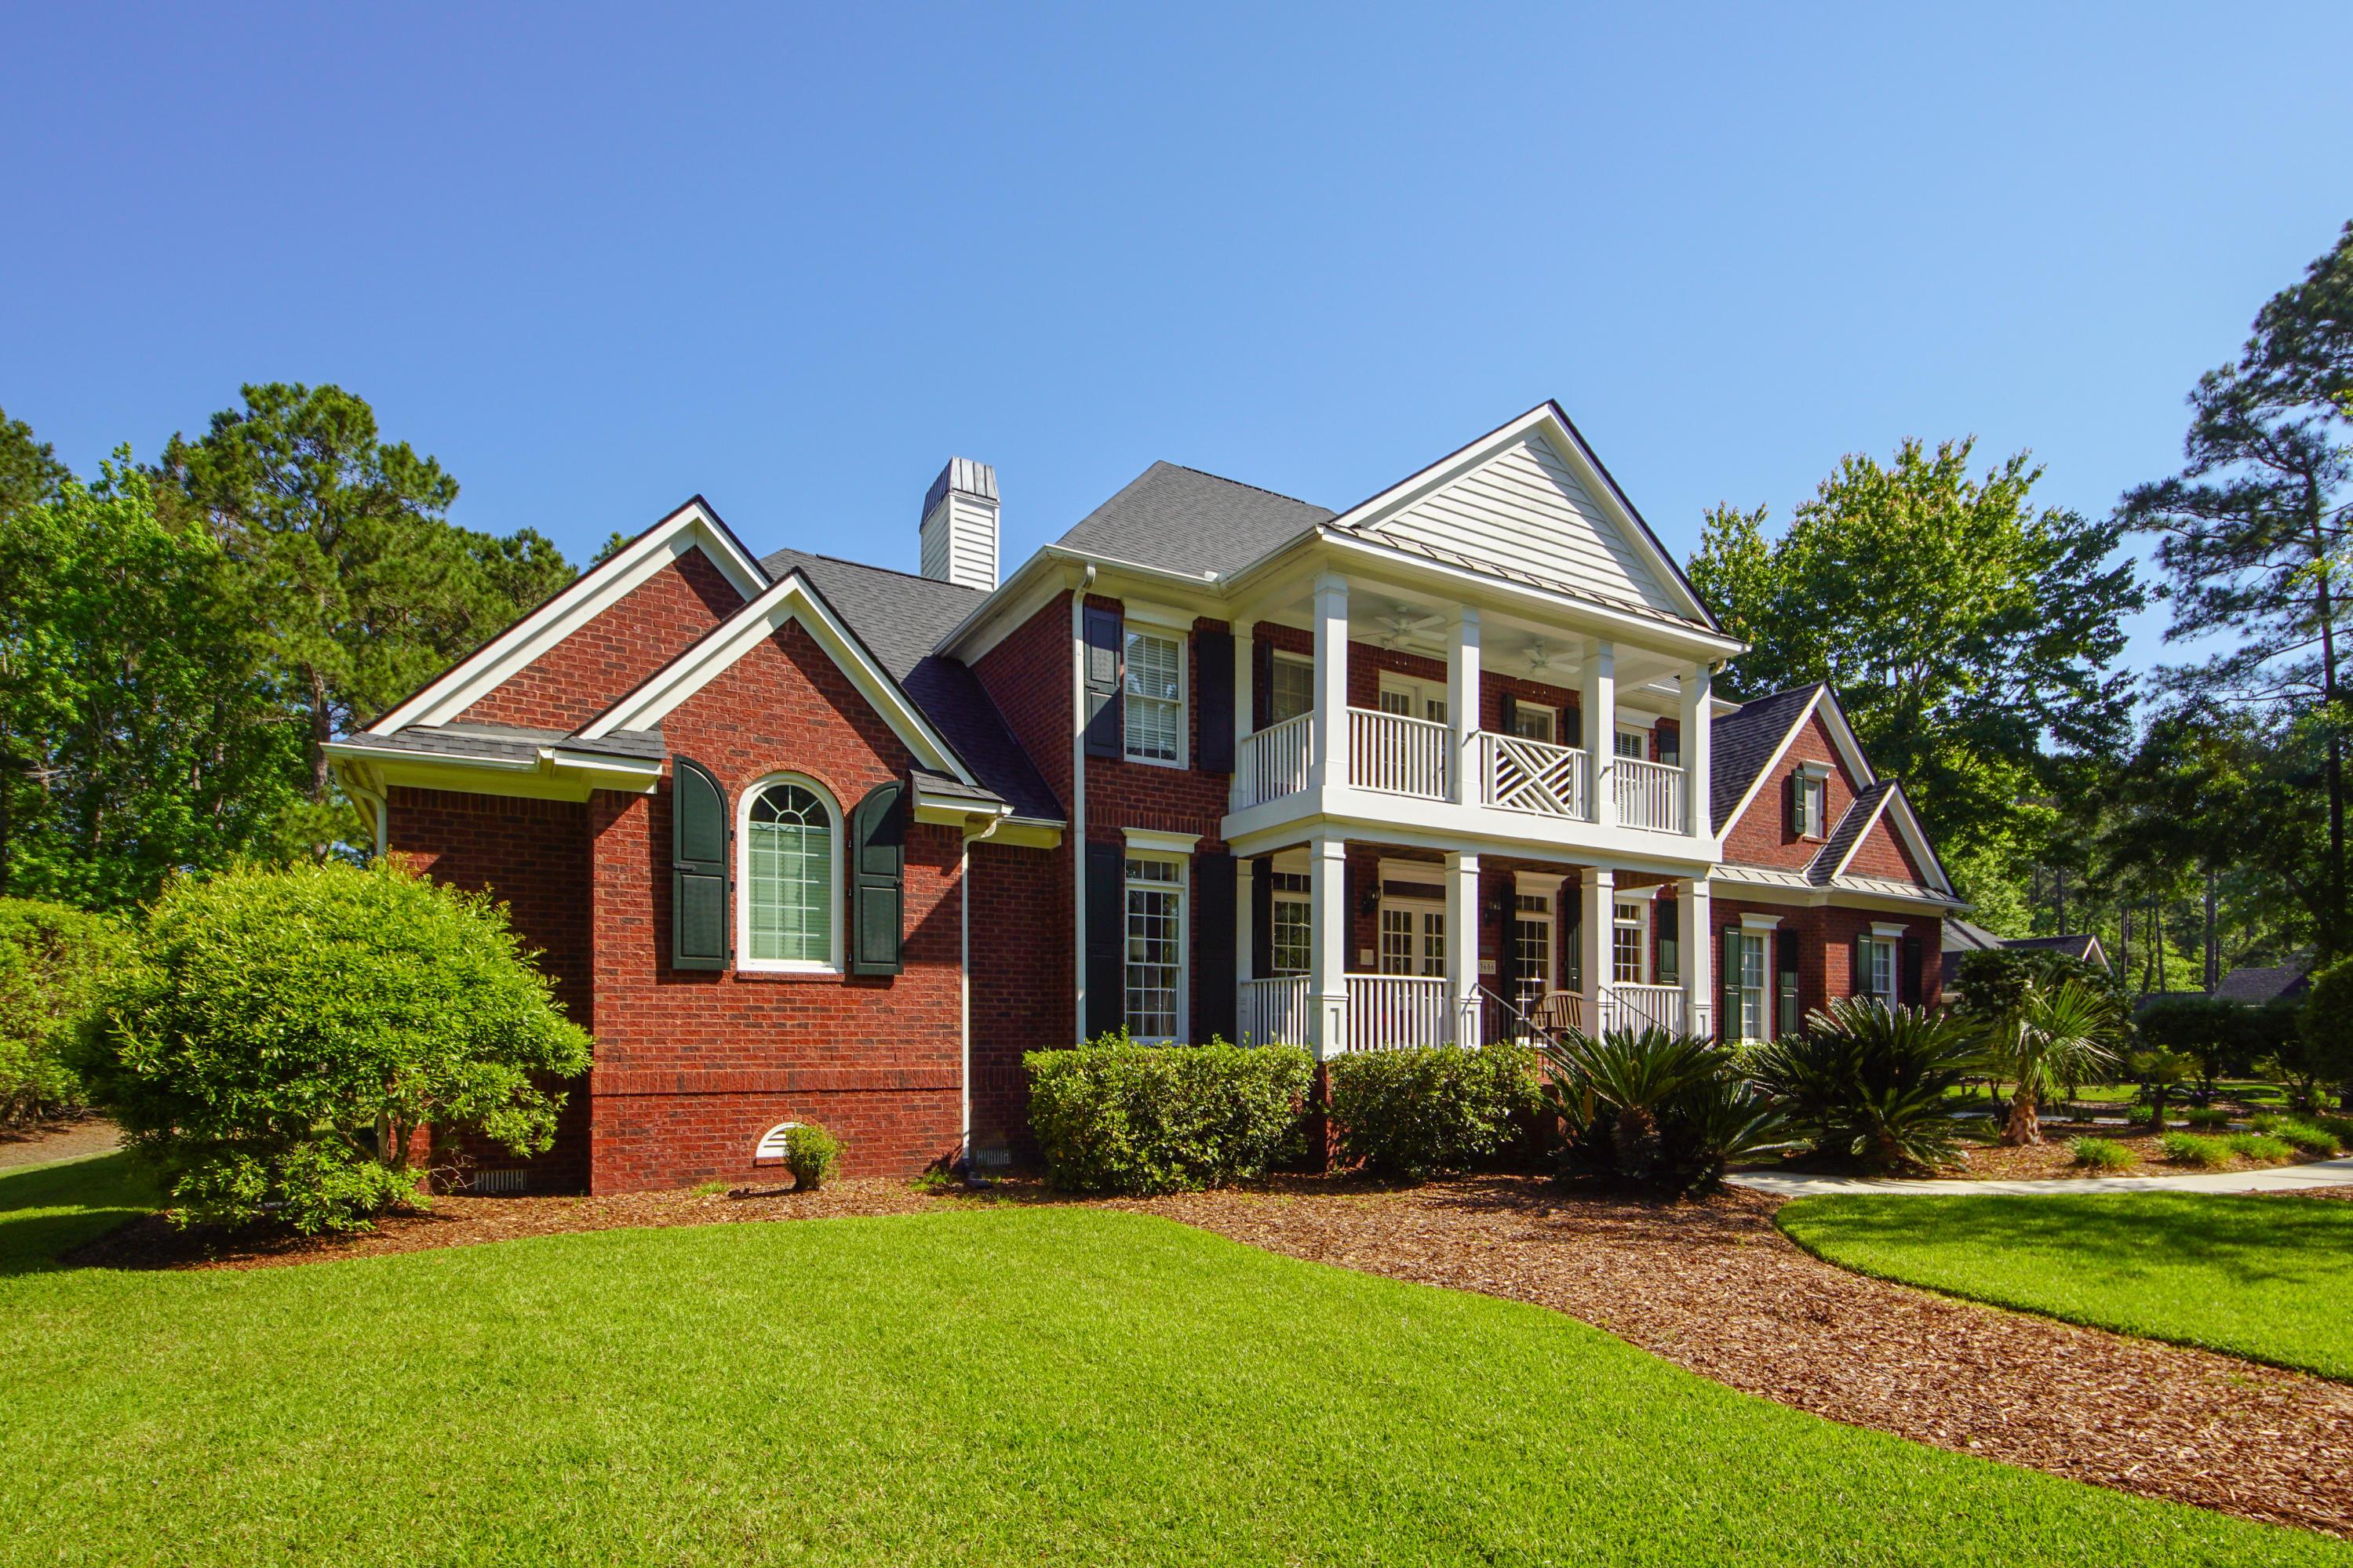 Dunes West Homes For Sale - 3656 Colonel Vanderhorst, Mount Pleasant, SC - 55